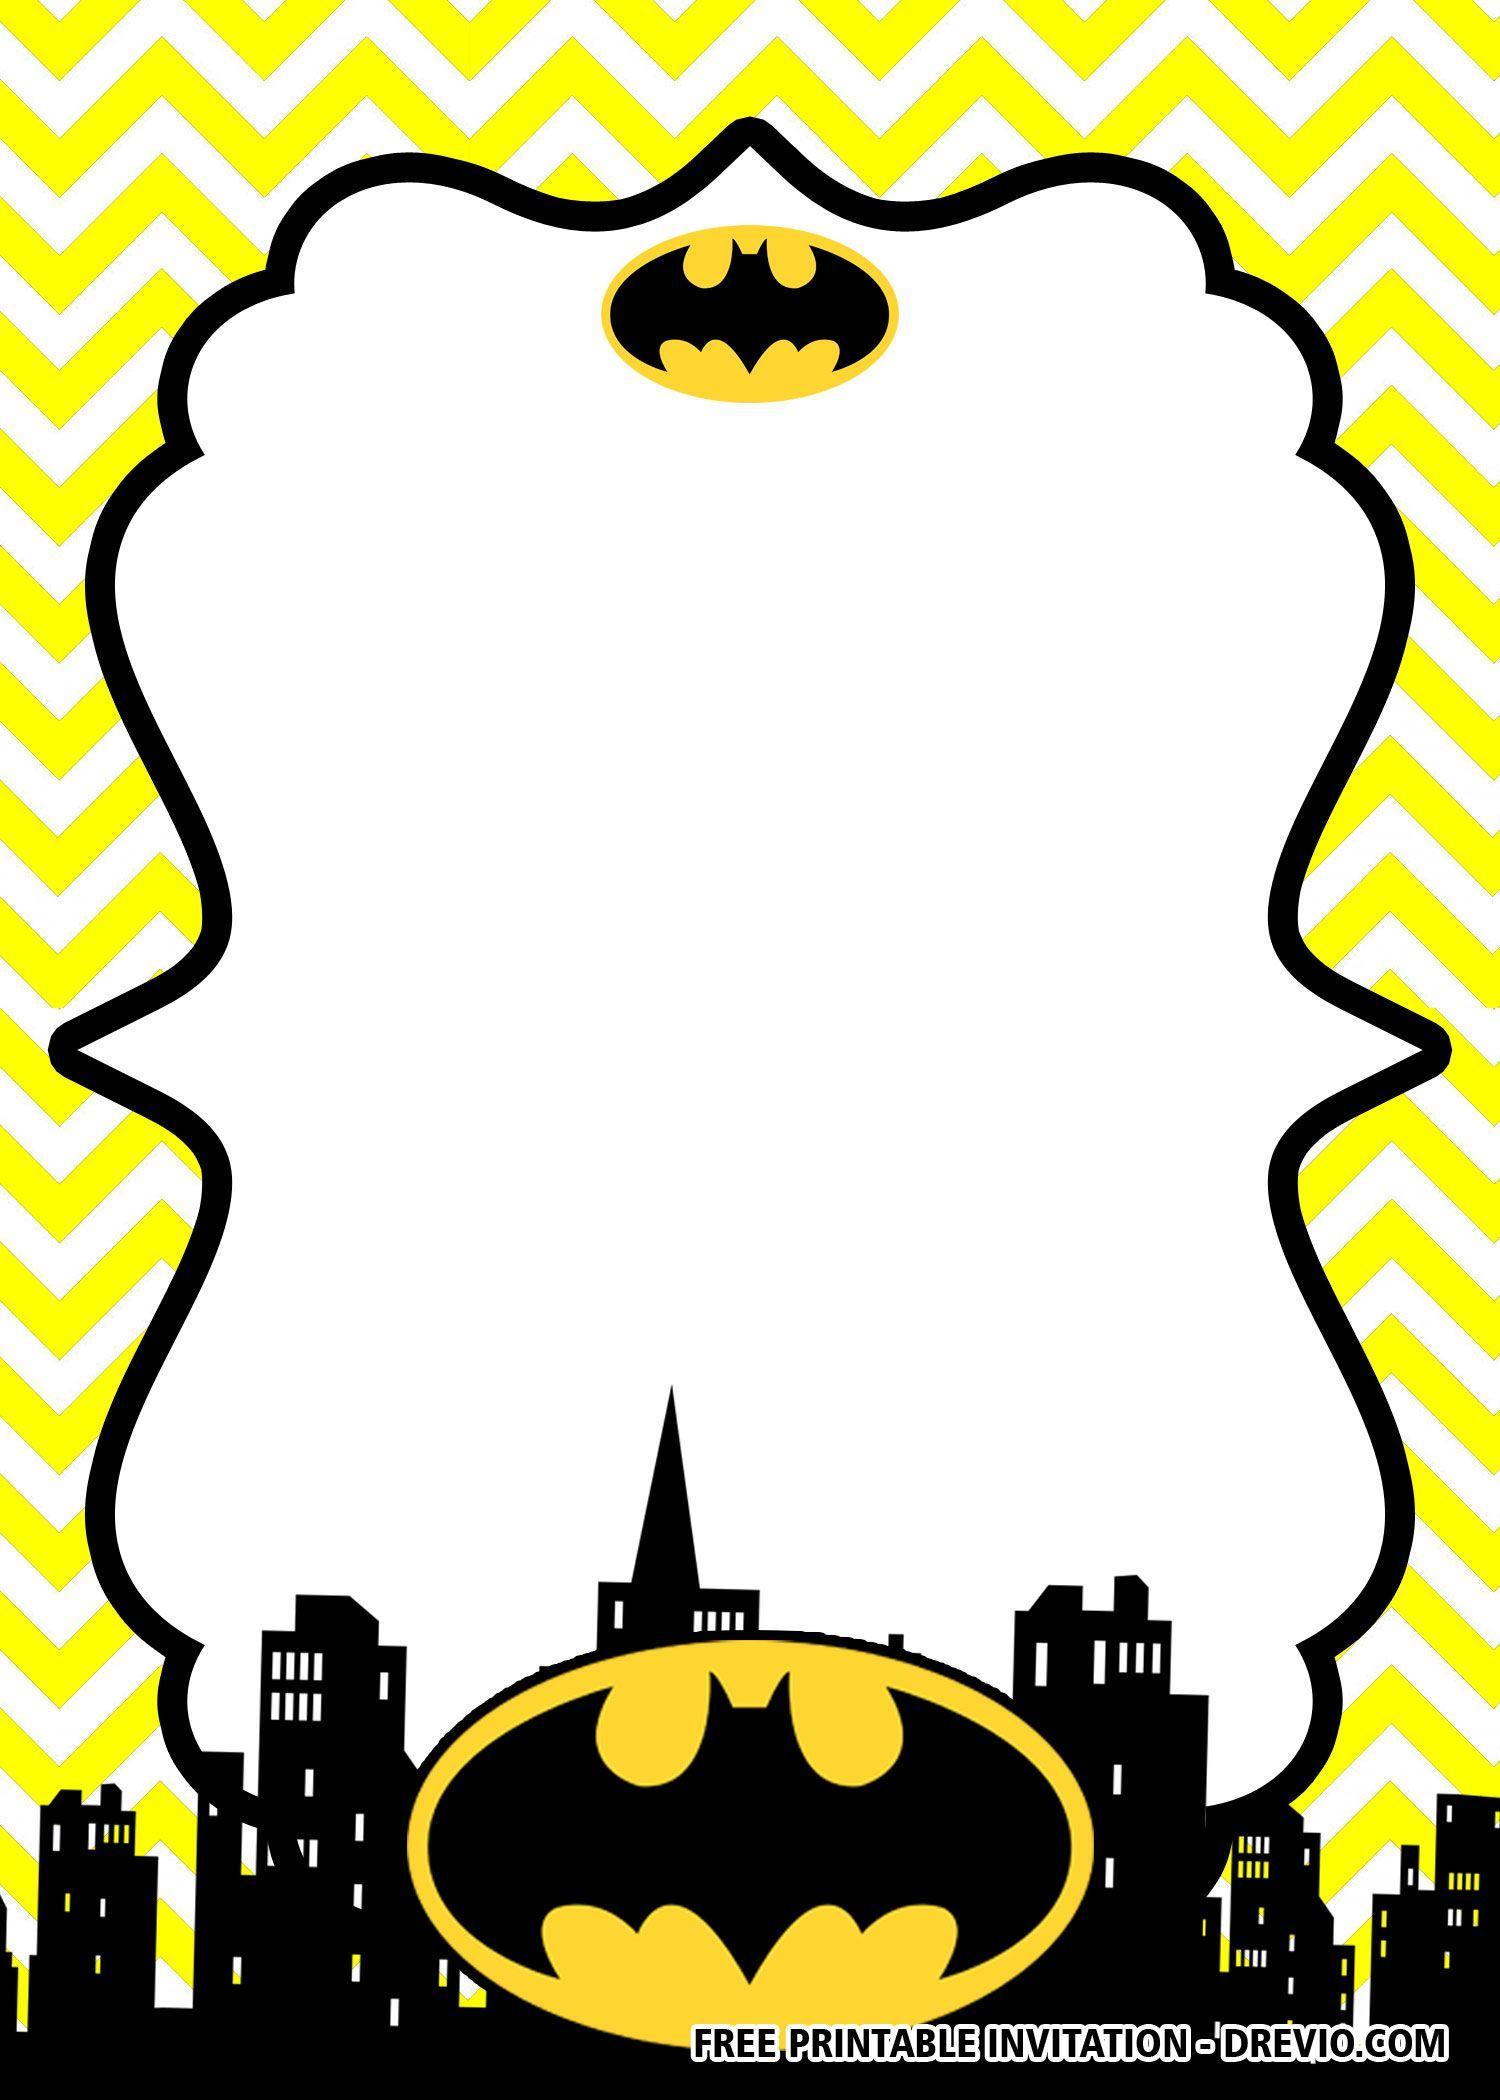 Free Printable Batman Birthday Invitation Templates Batman Invitations Superhero Birthday Invitations Batman Birthday